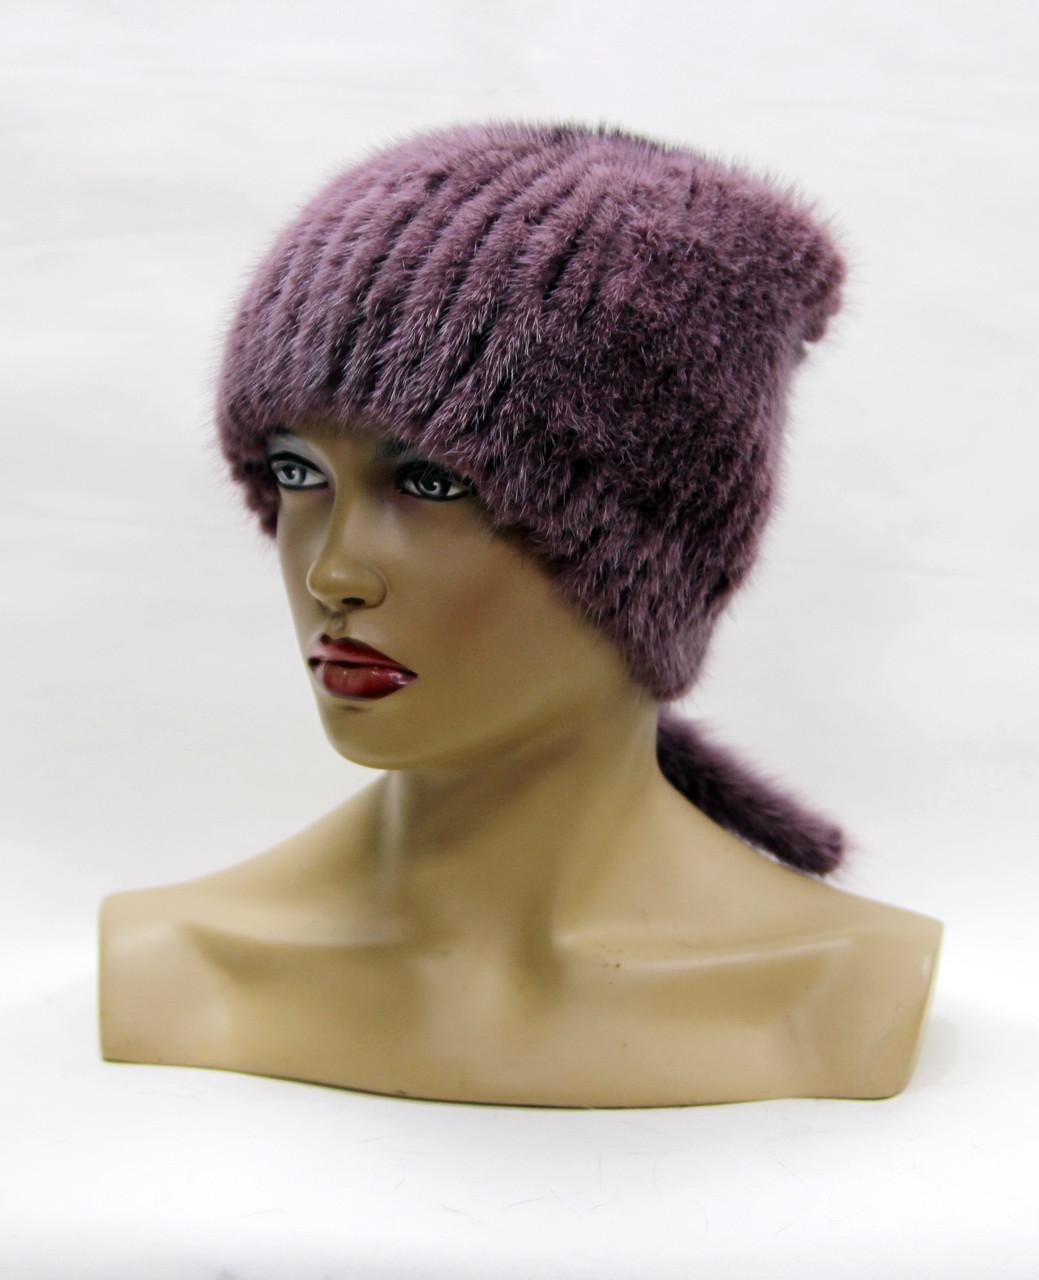 норковая шапка на вязаной основе хвост сирень продажа цена в